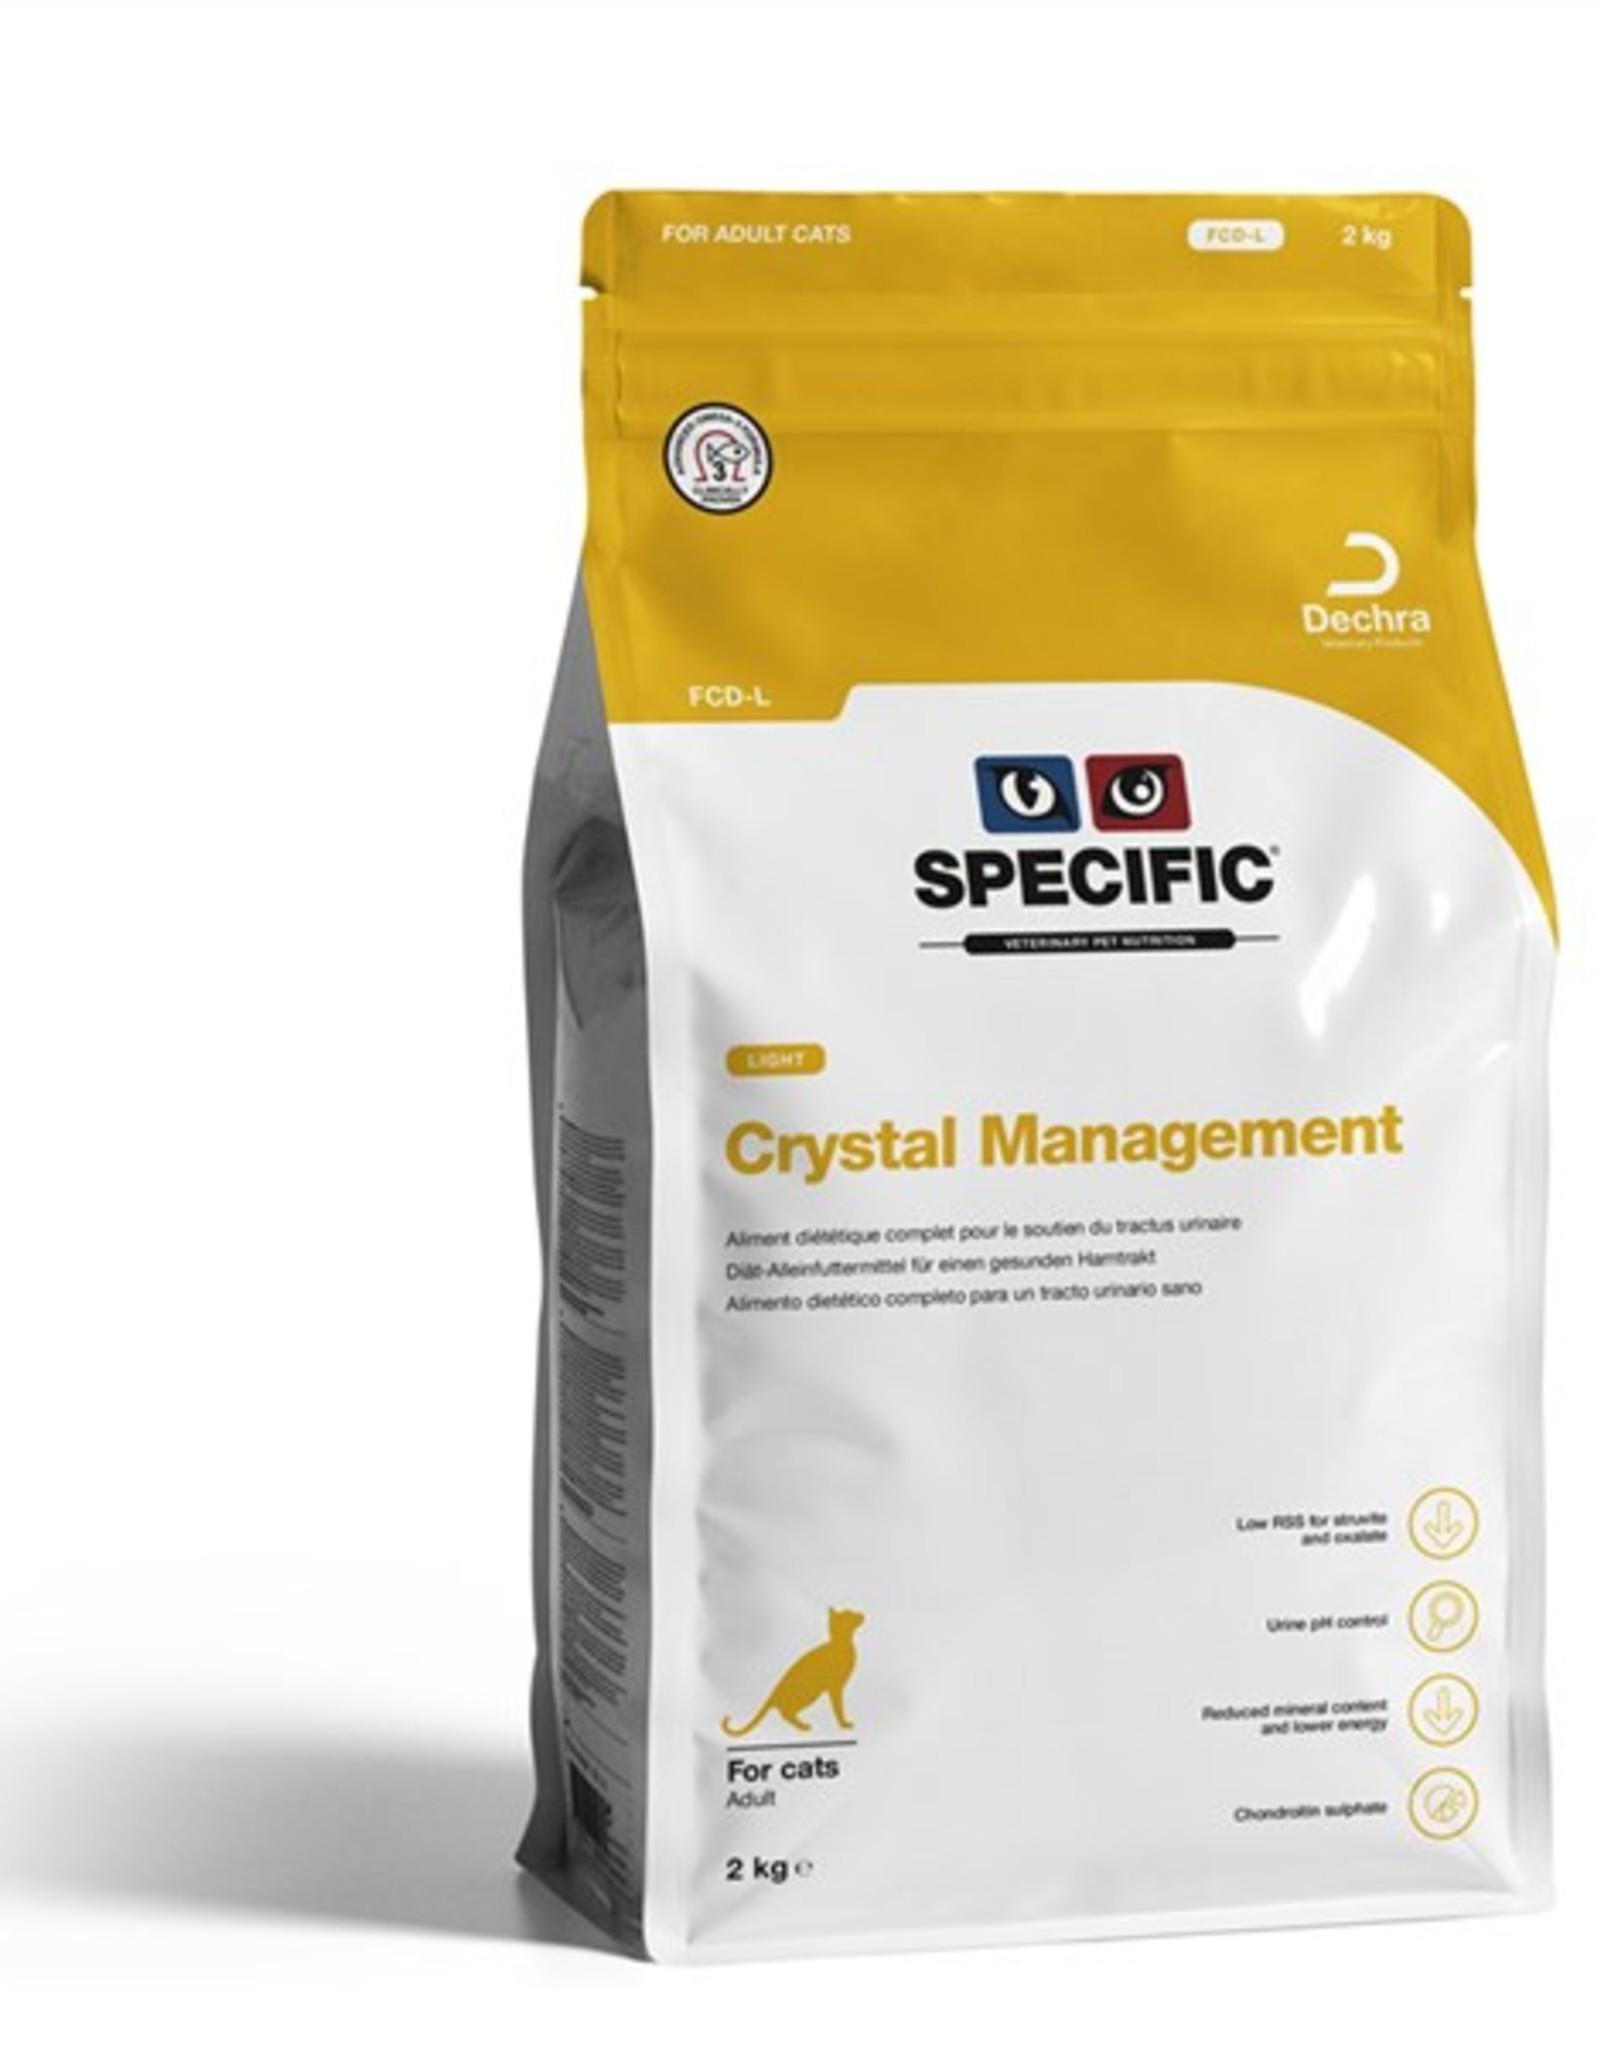 Specific Specific Fcd-l Crystal Management Light Kat 2kg